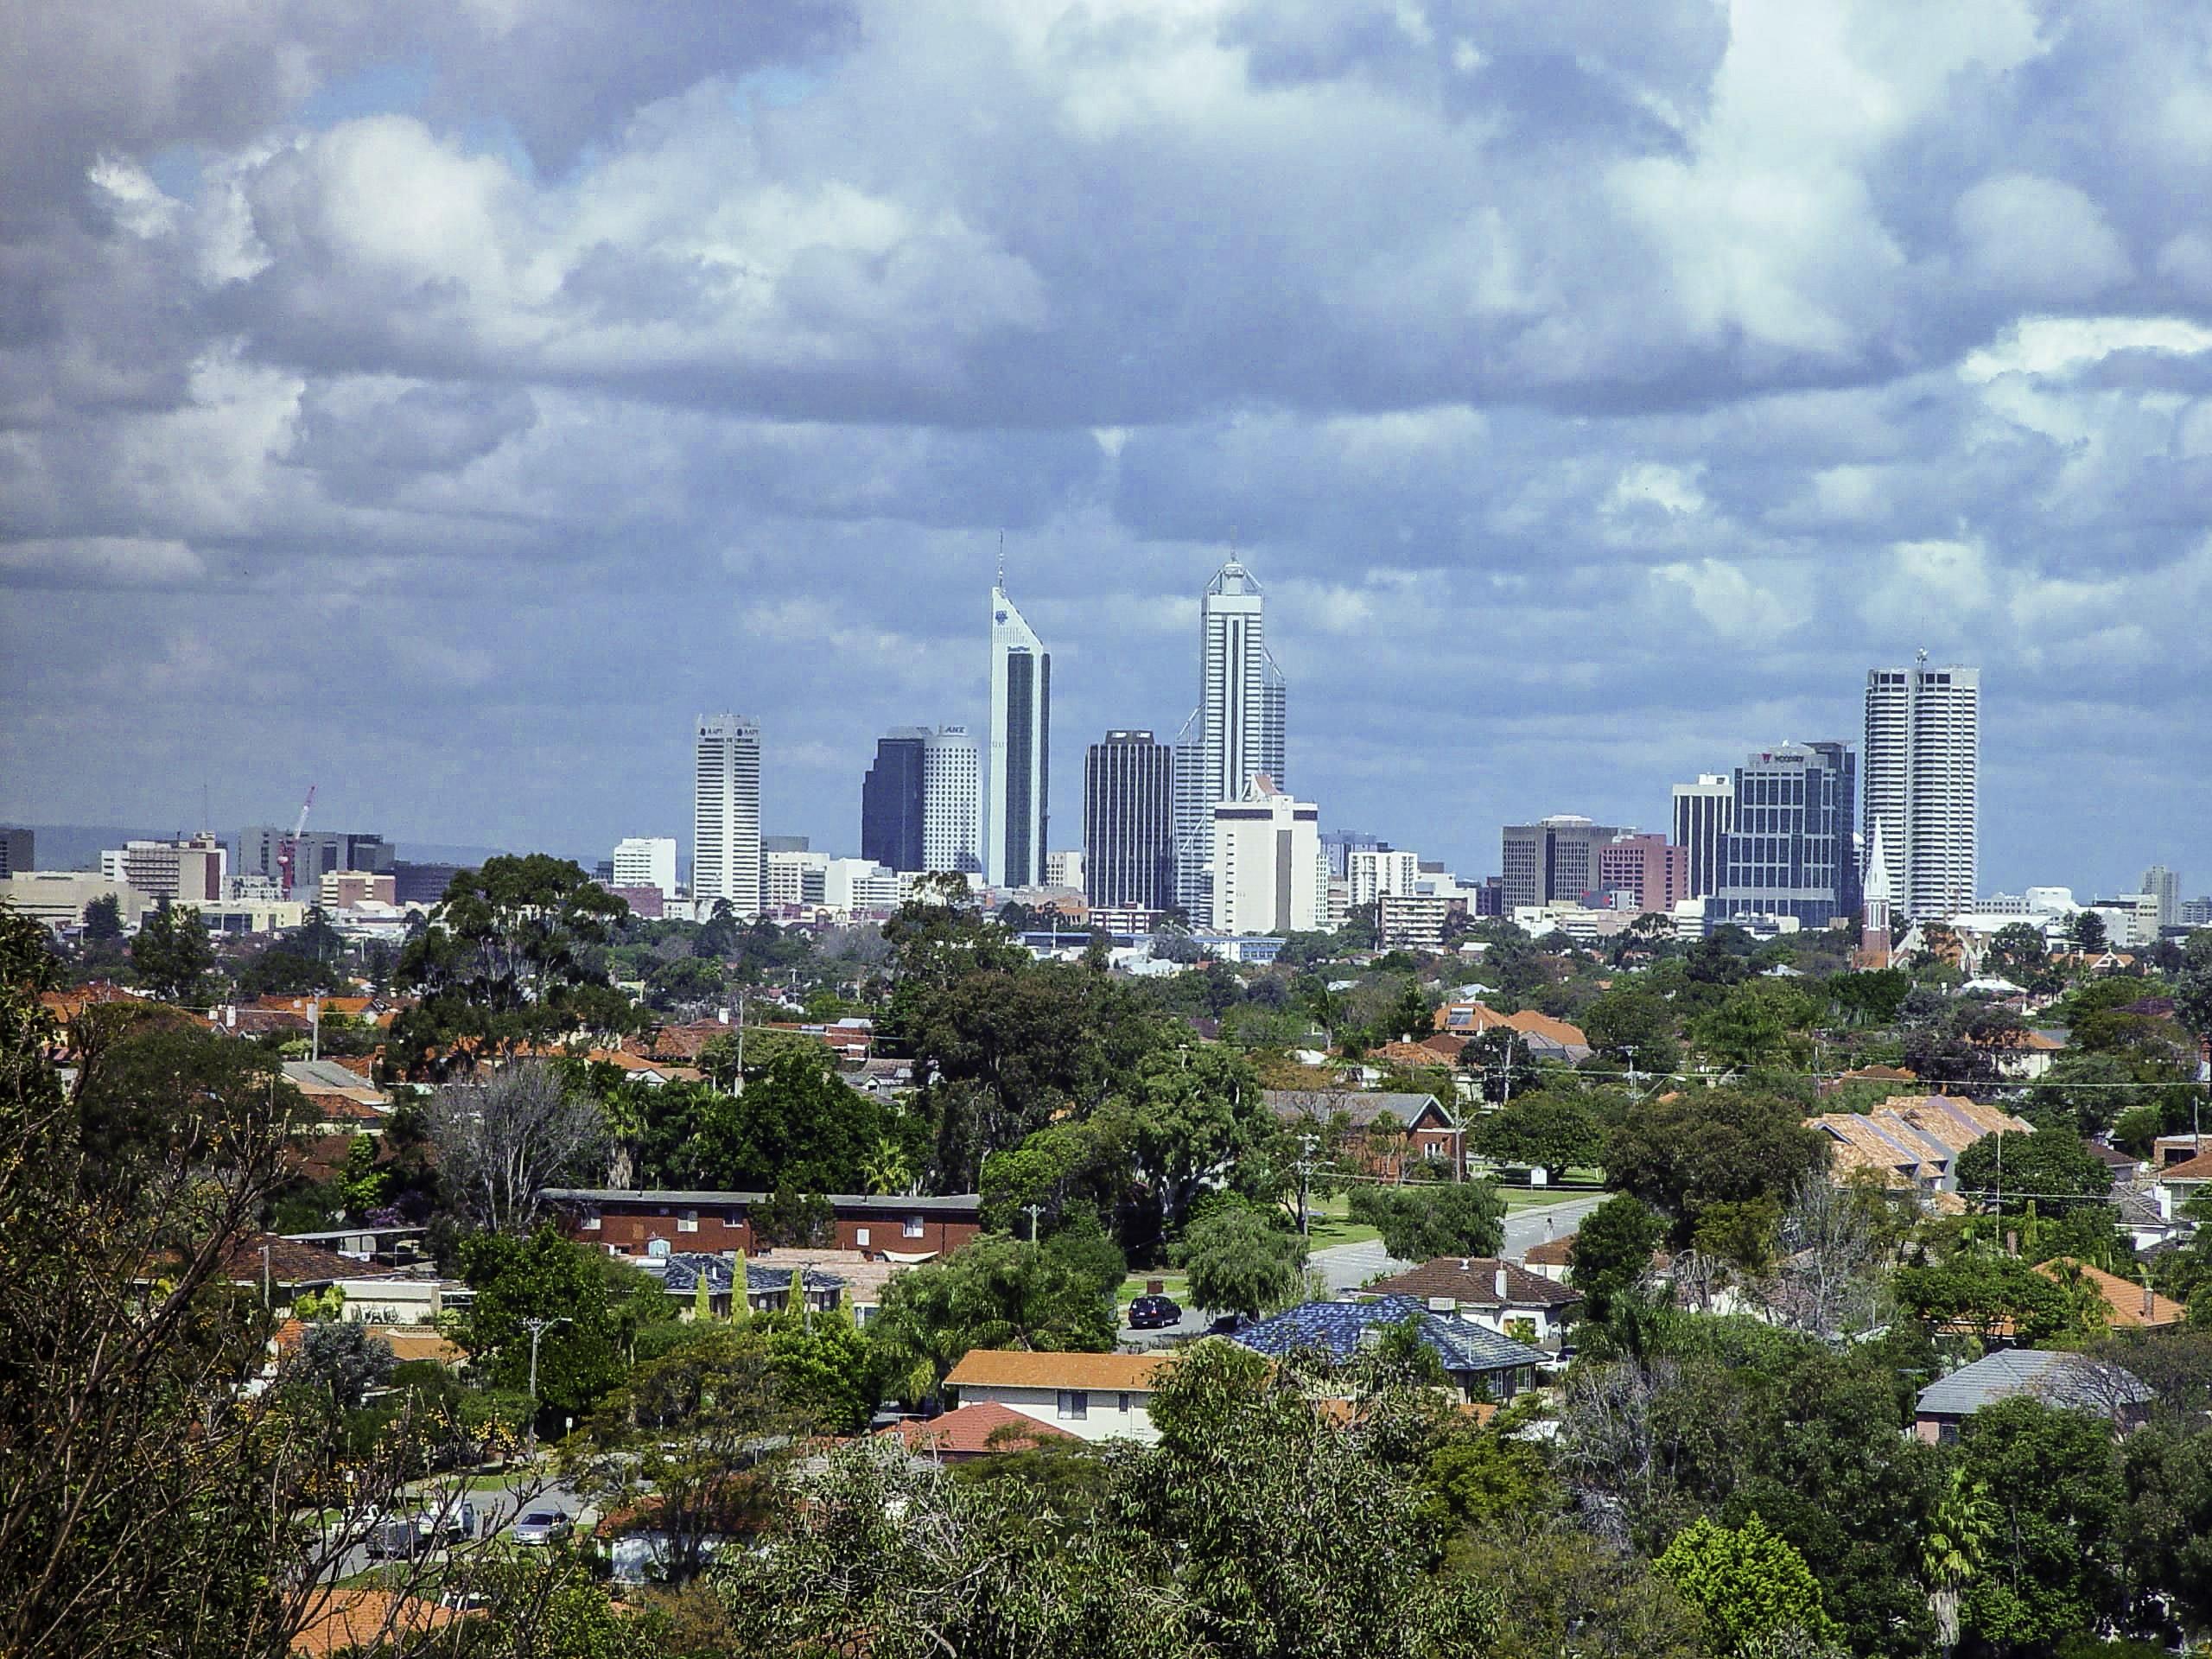 skyline-and-cityscape-view-of-perth-australia